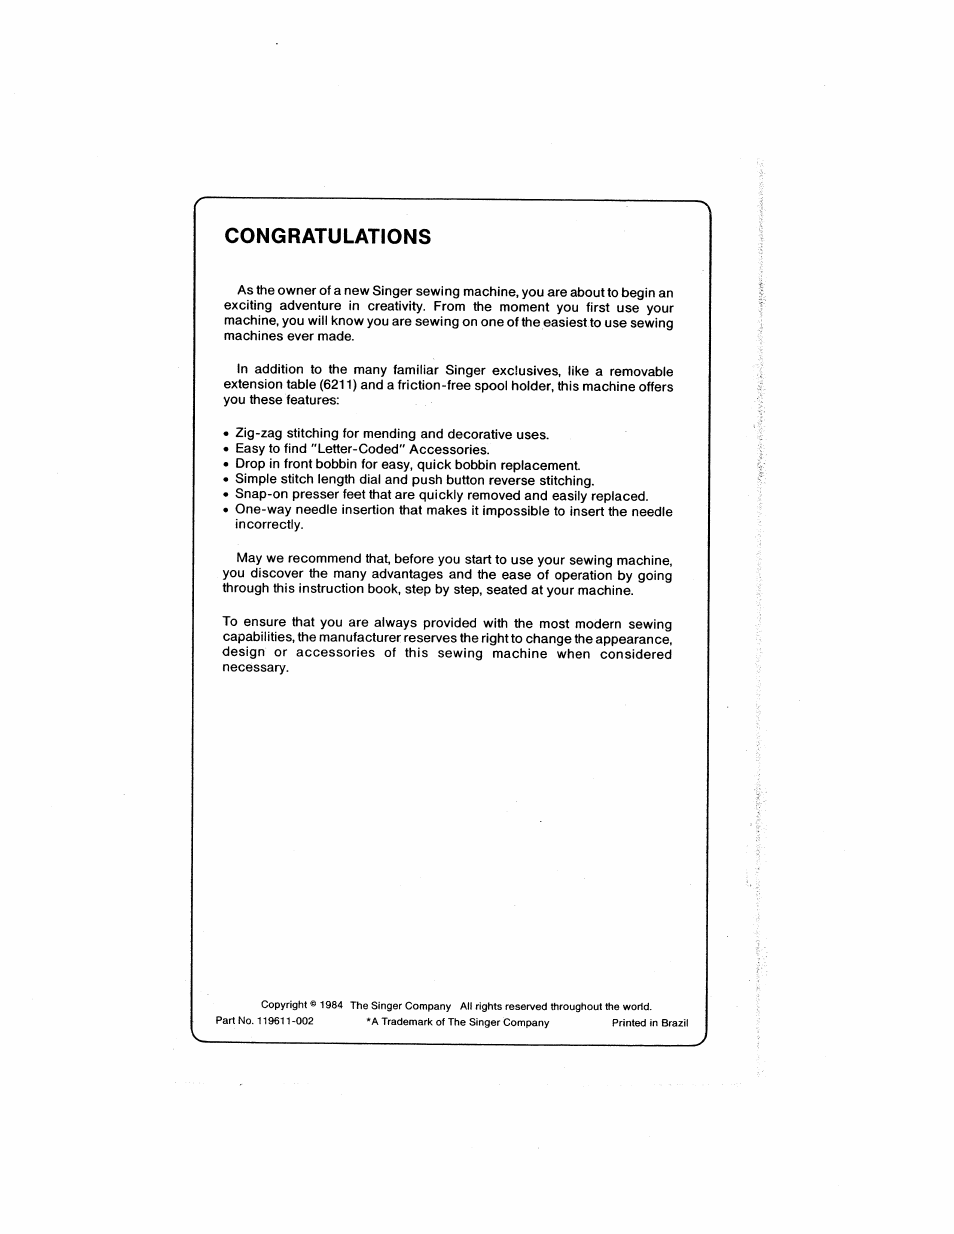 Congratulations | SINGER 6211 User Manual | Page 2 / 36